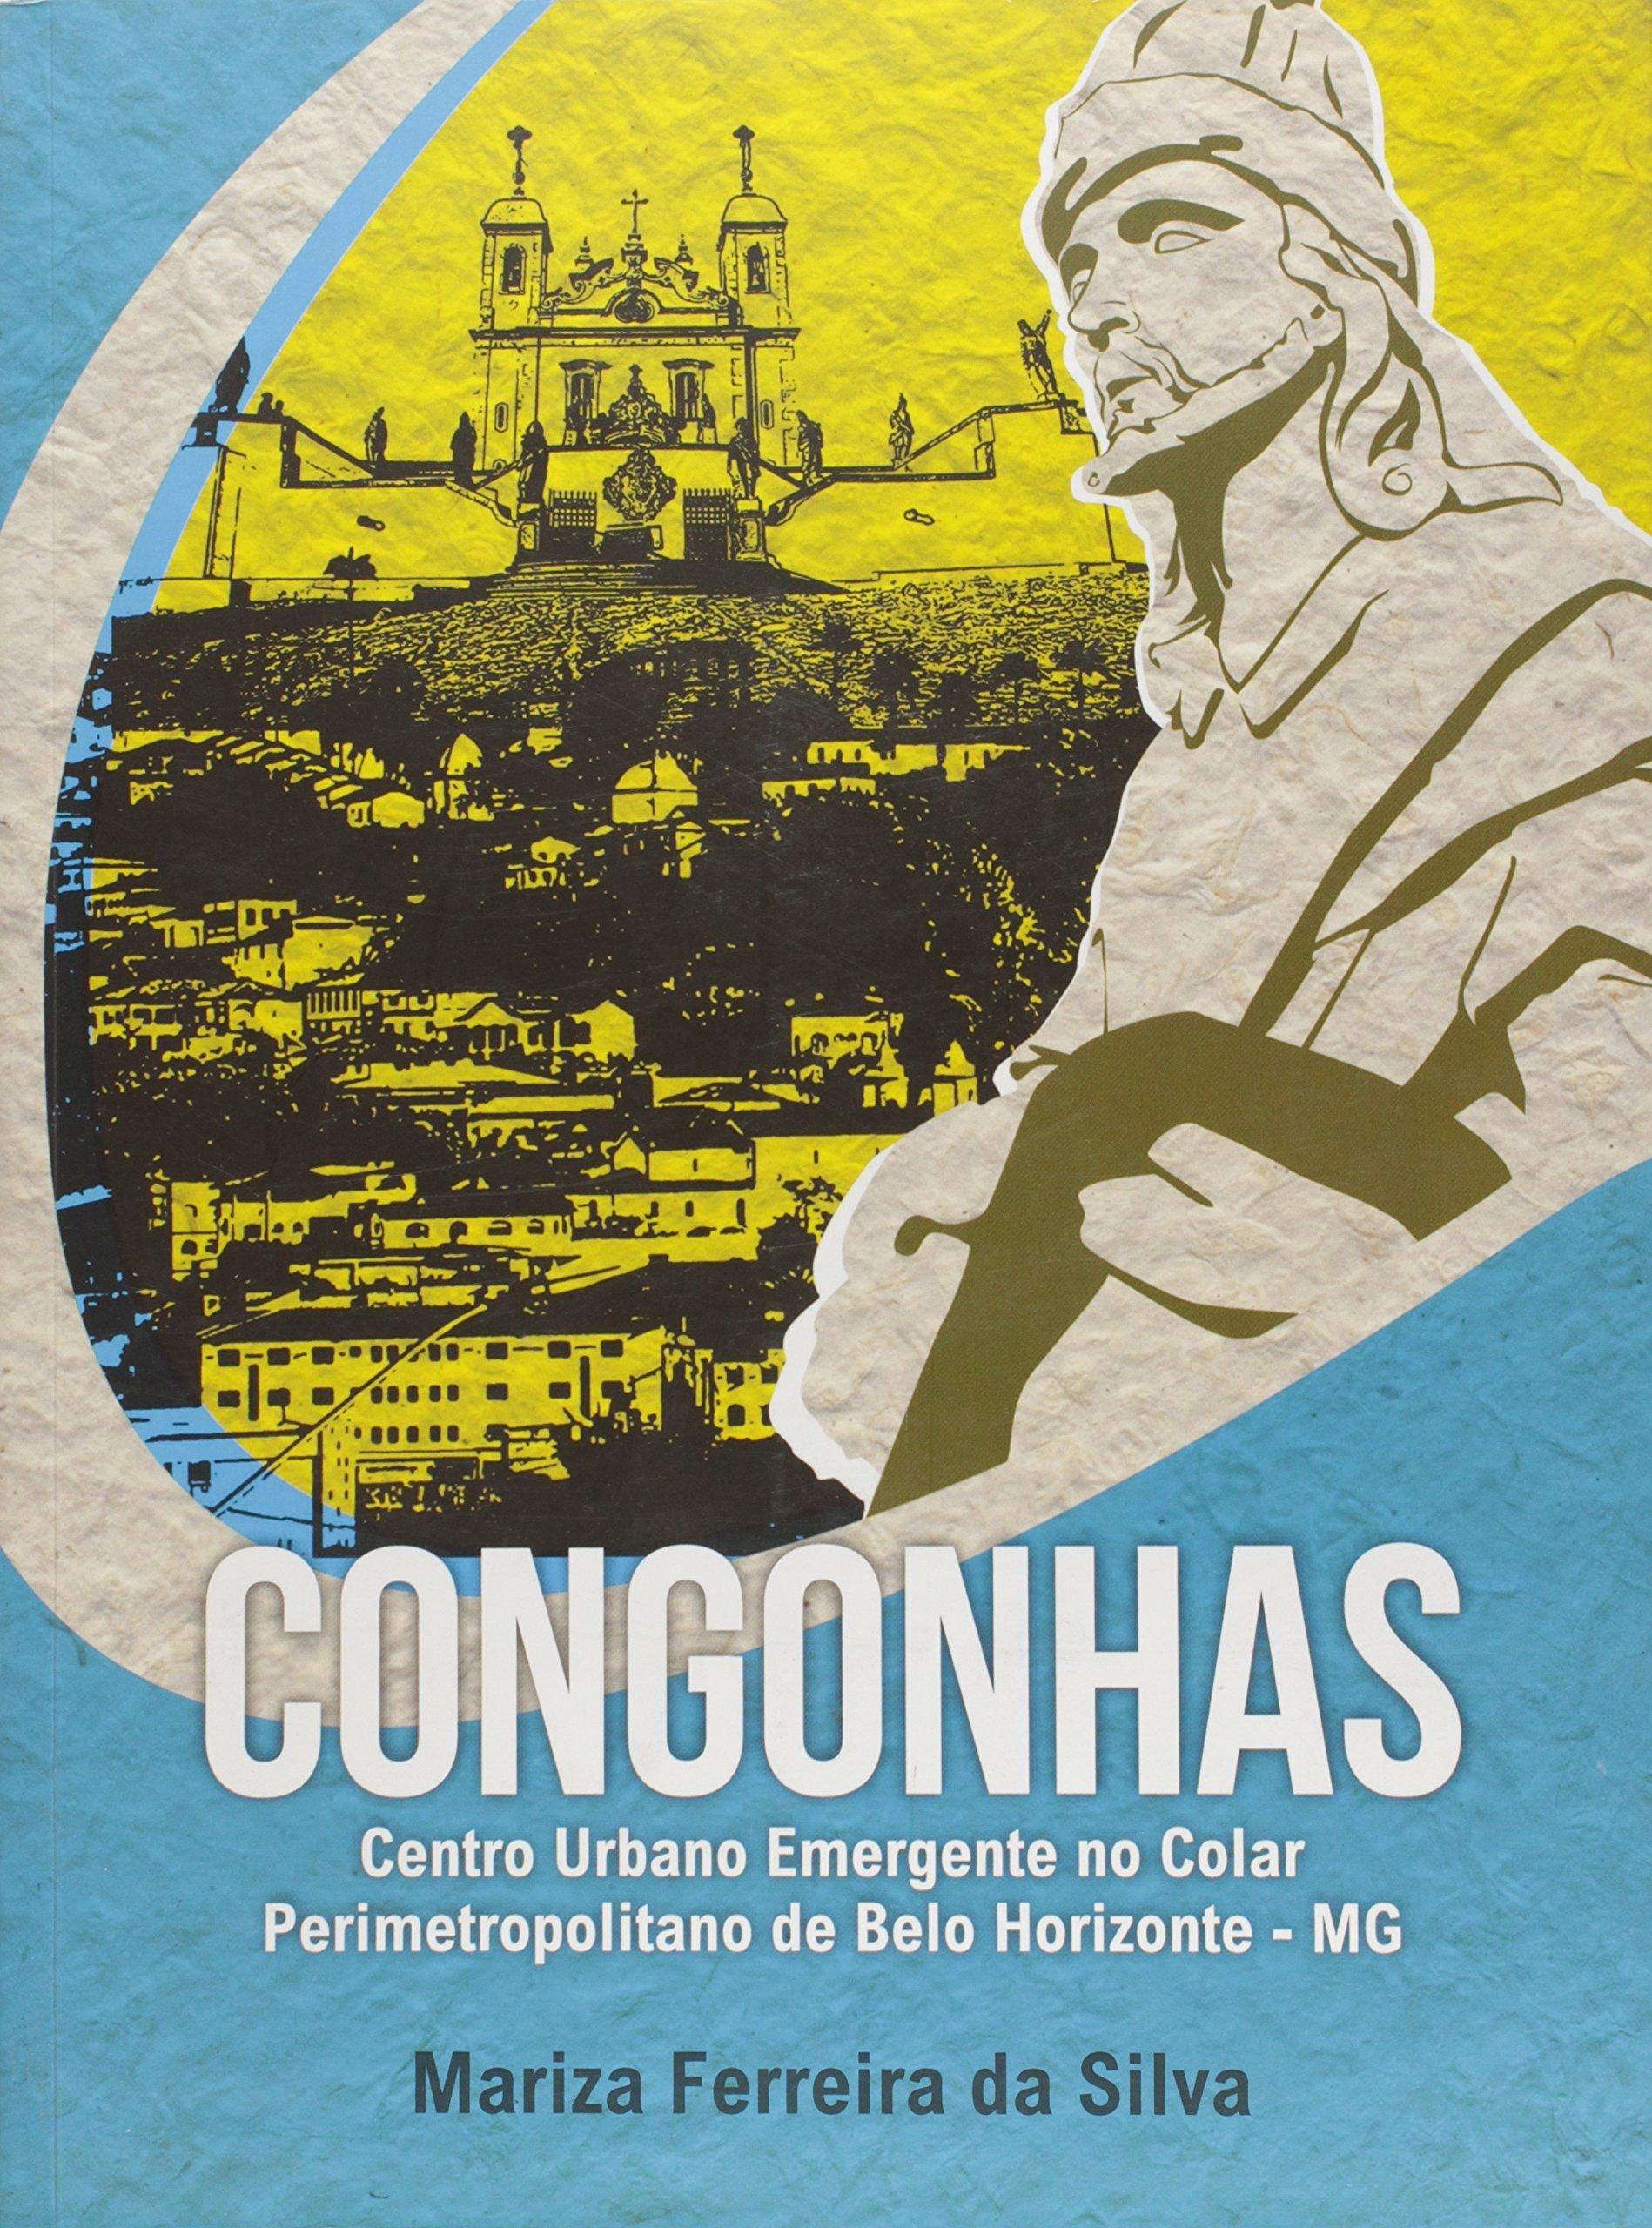 Download Congonhas: Centro Urbano Emergente no Colar Perimetropolitano de Belo Horizonte - Mg pdf